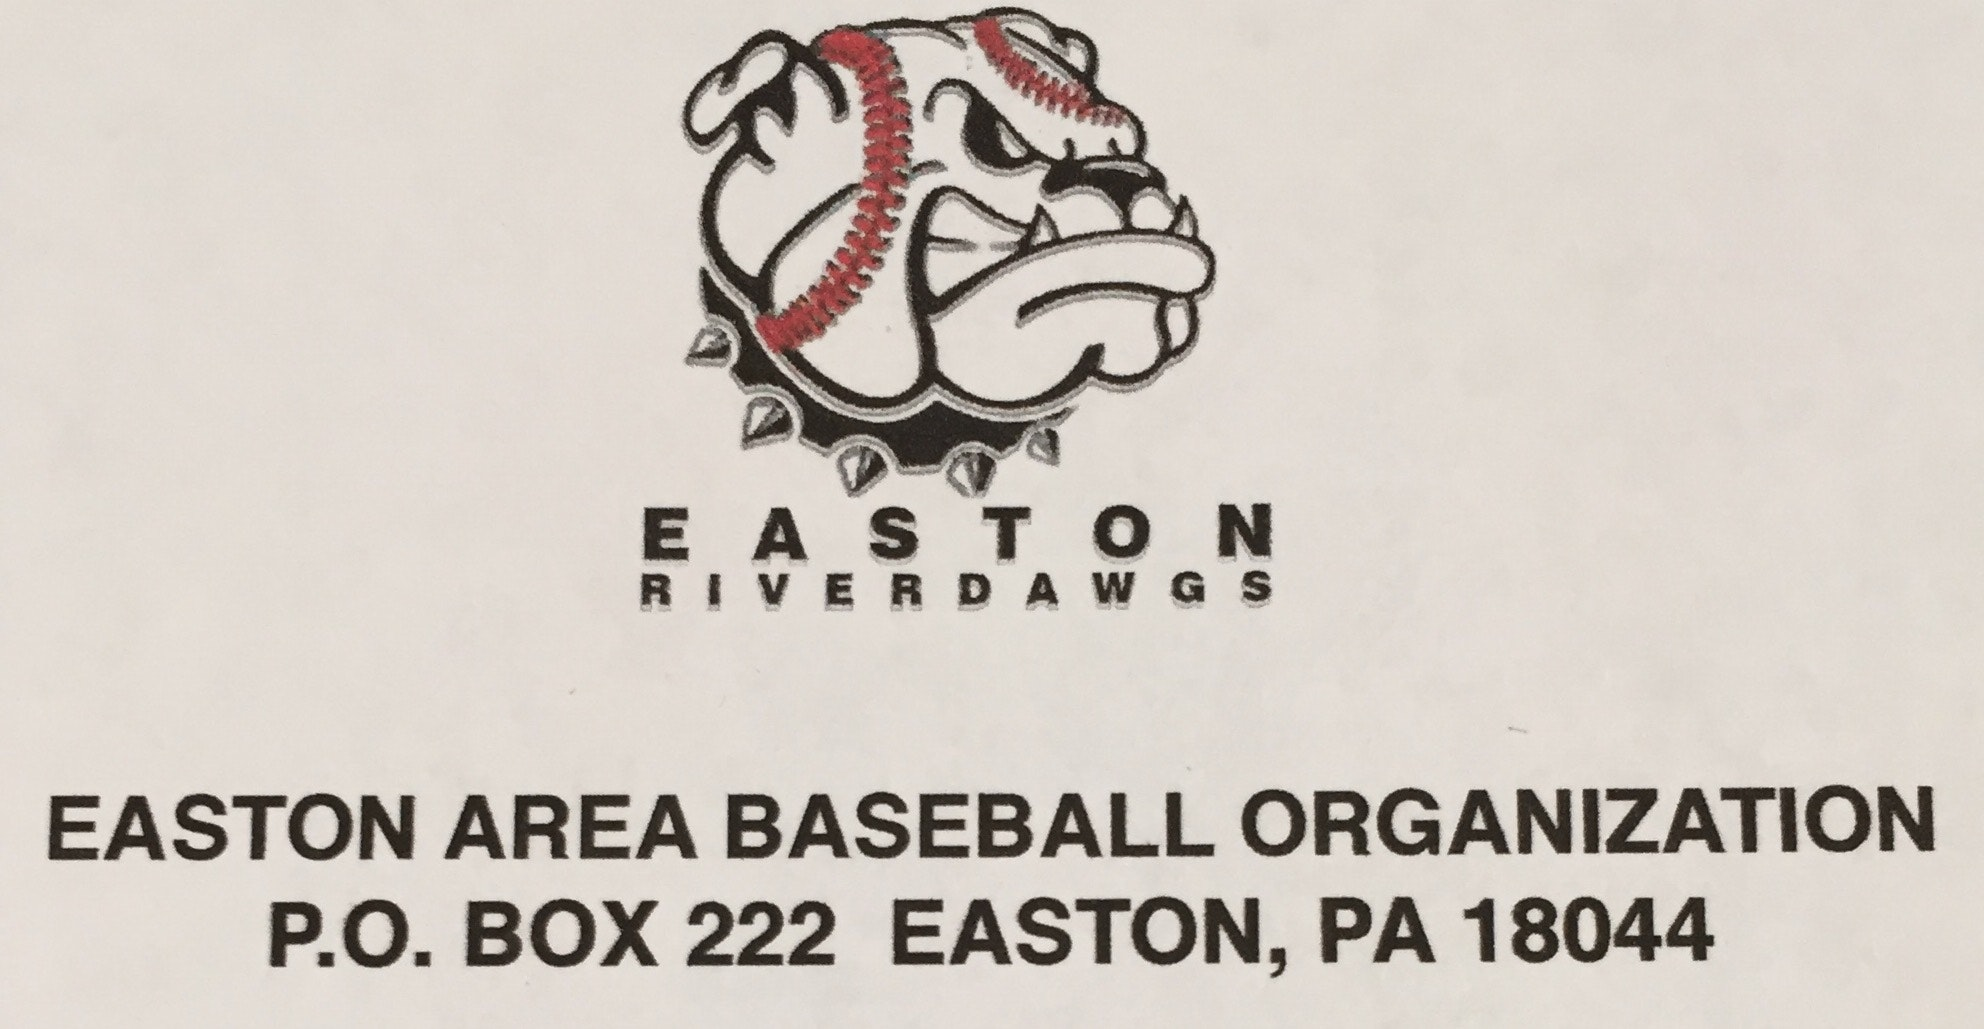 Easton Area Baseball Organization (RiverDawgs) Tournament Fundraiser